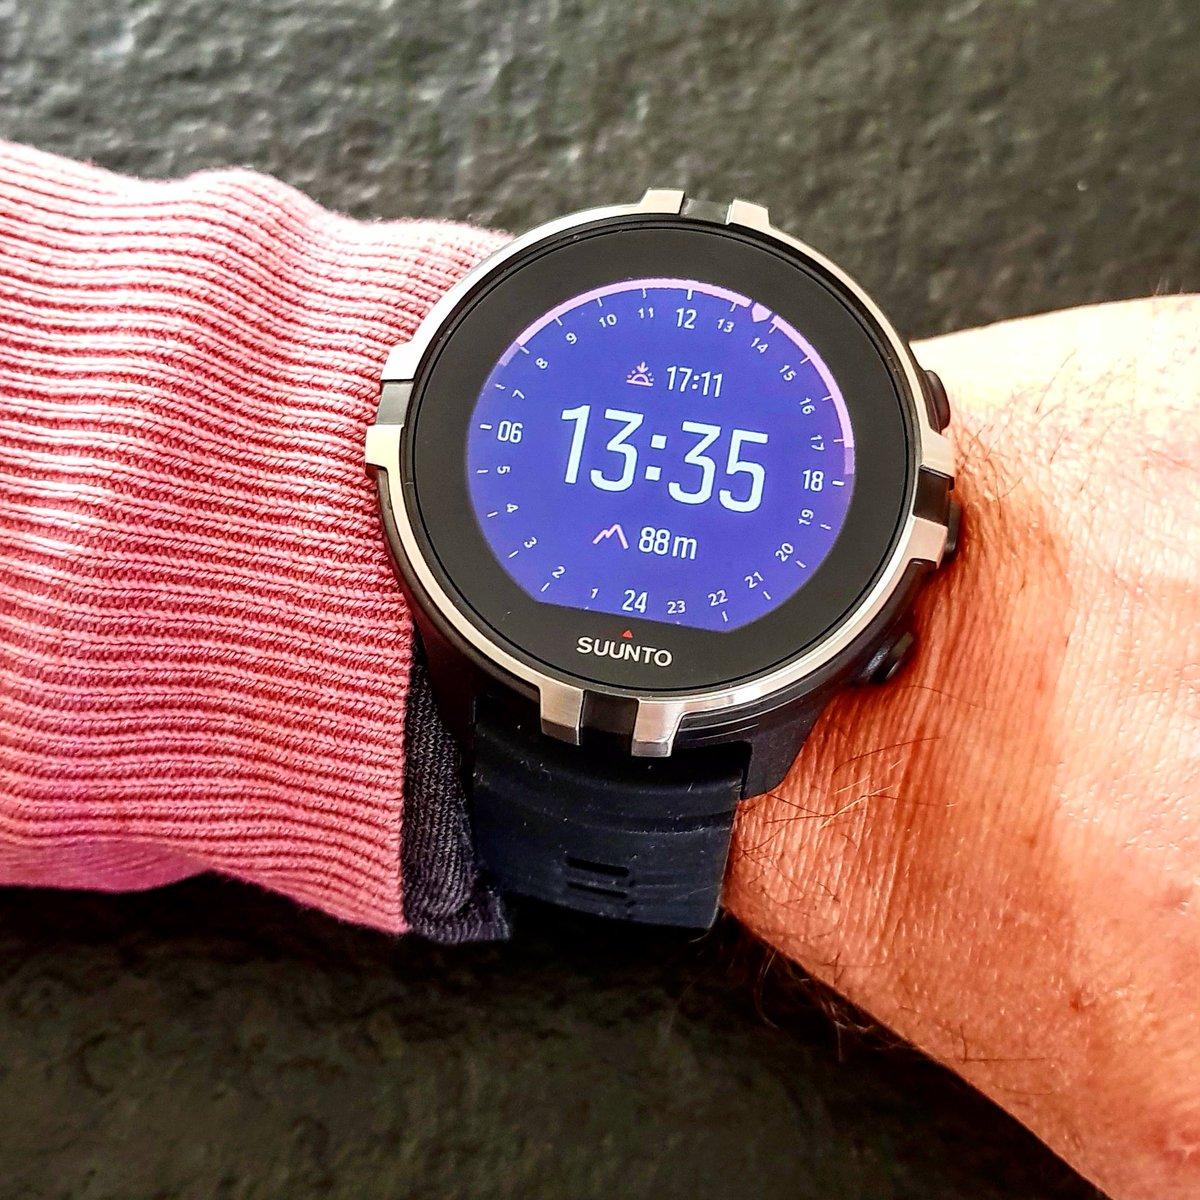 Friday wear ! Du coup j'ai mis pull assorti à ma montre. Ou inversement :) #suunto #suuntospartan #gps #running #watchface #watch pic.twitter.com/mlISzedwnO